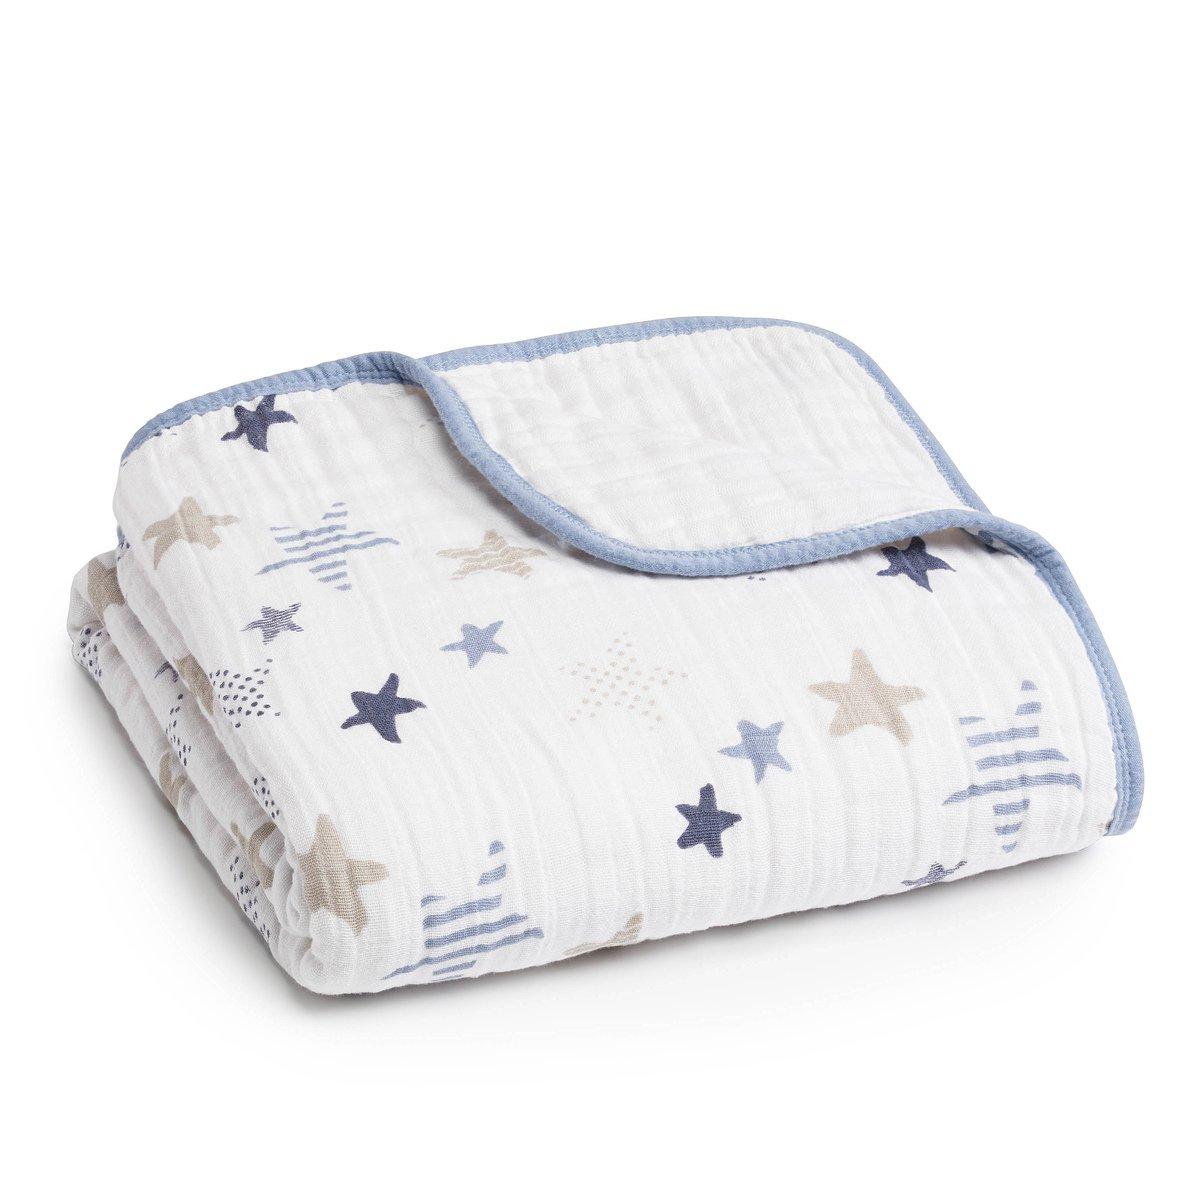 aden + anais Dream Blanket | Boutique Muslin Baby Blankets for Girls & Boys | Ideal Lightweight Newborn Nursery & Crib Blanket | Unisex Toddler & Infant Bedding, Shower & Registry Gifts, Rock Star by aden + anais